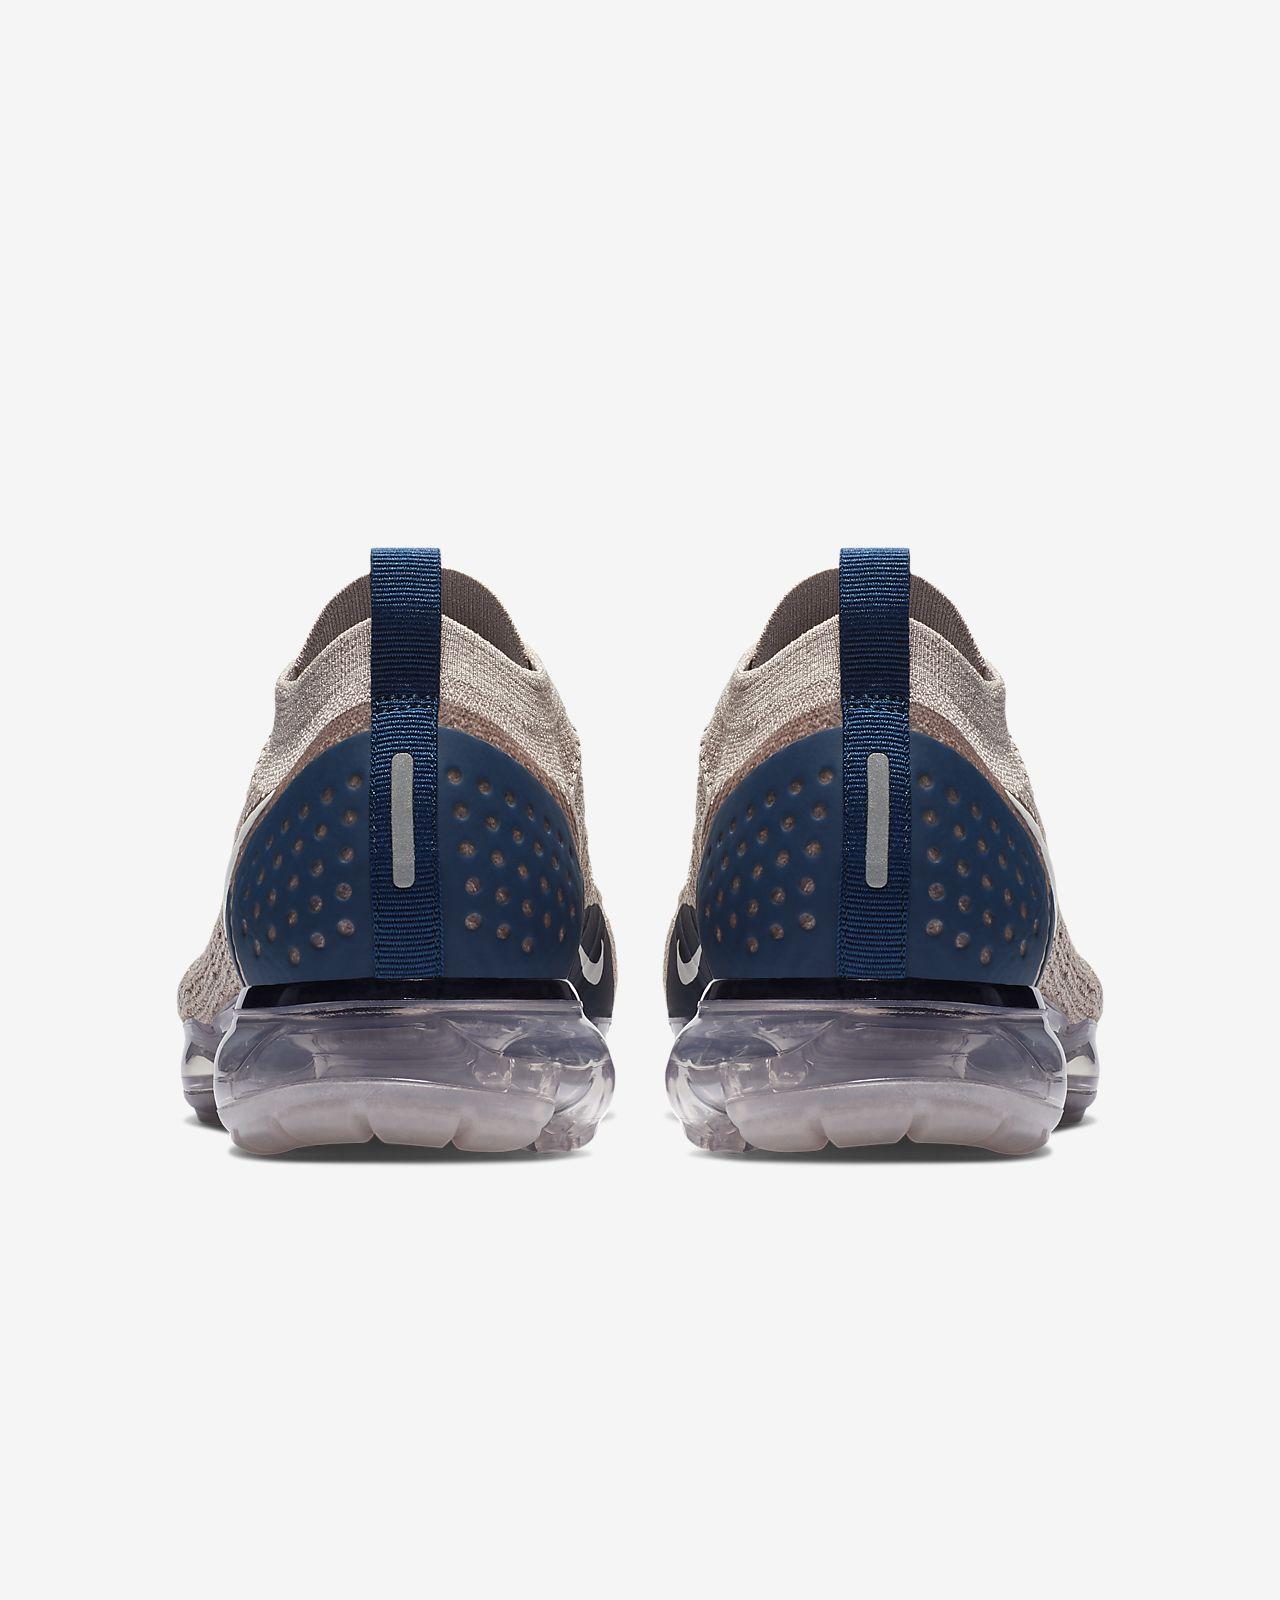 49950f9db47b Nike Air VaporMax Flyknit 2 Shoe. Nike.com NL